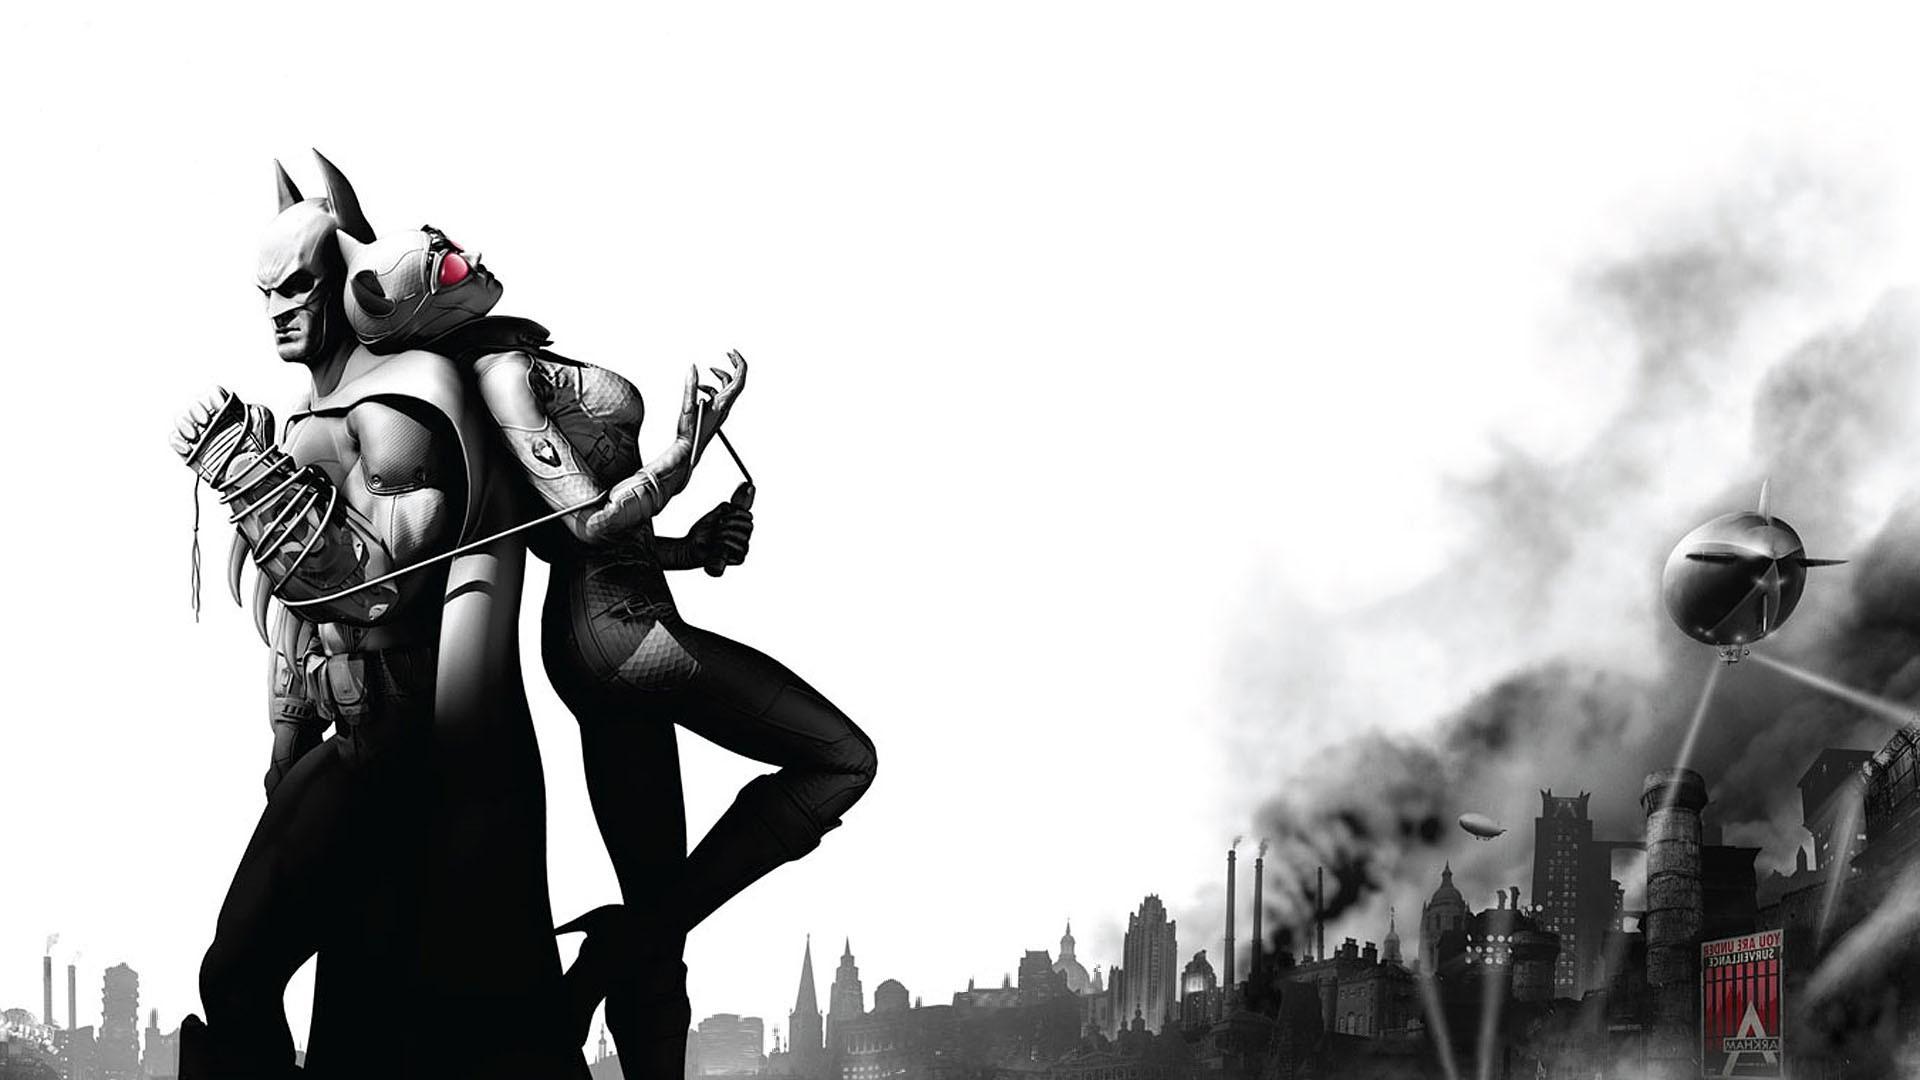 Wallpaper 1920x1080 Px Batman Arkham City Catwoman 1920x1080